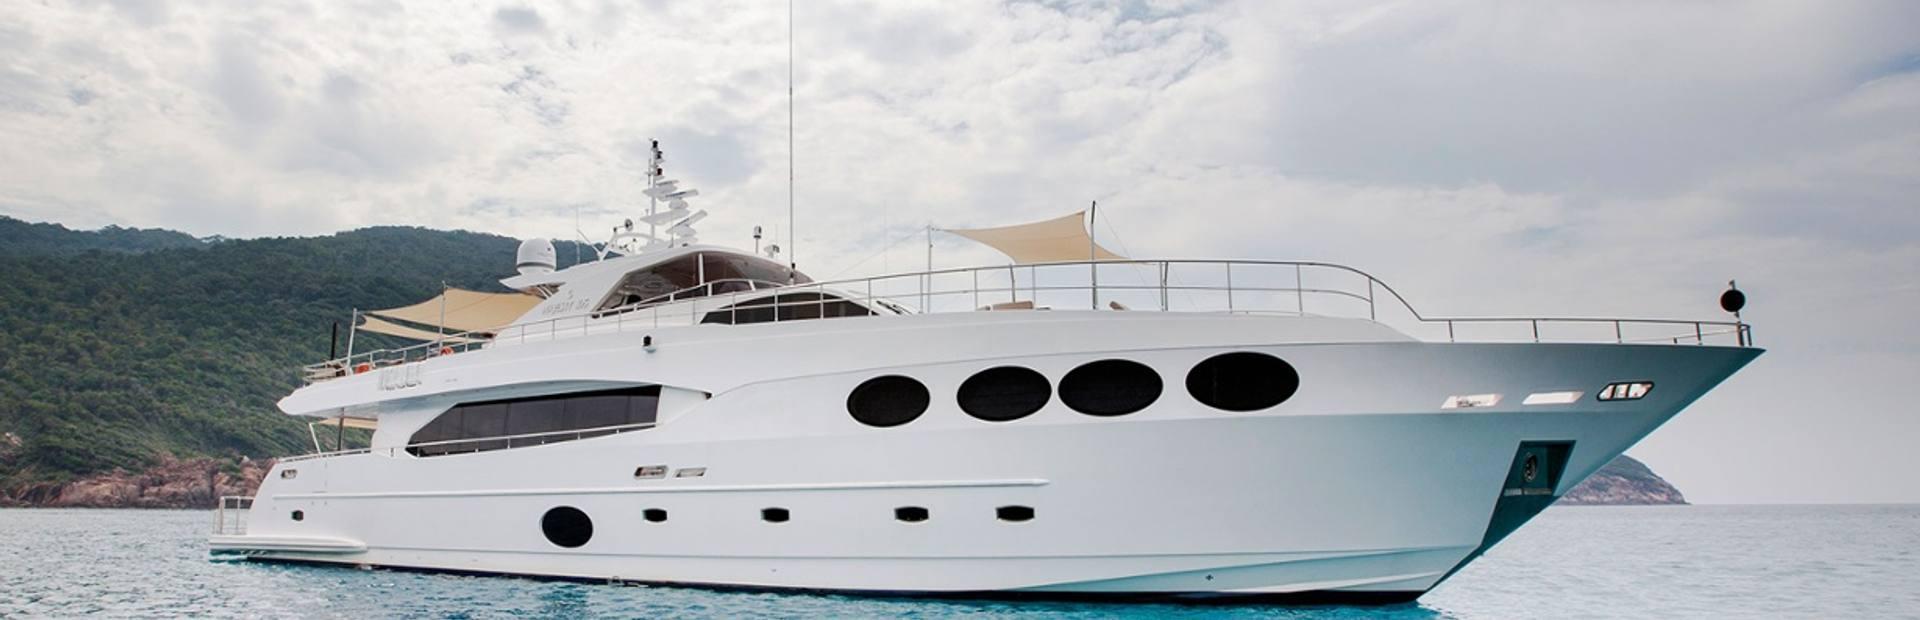 Majesty 105 Yacht Charter